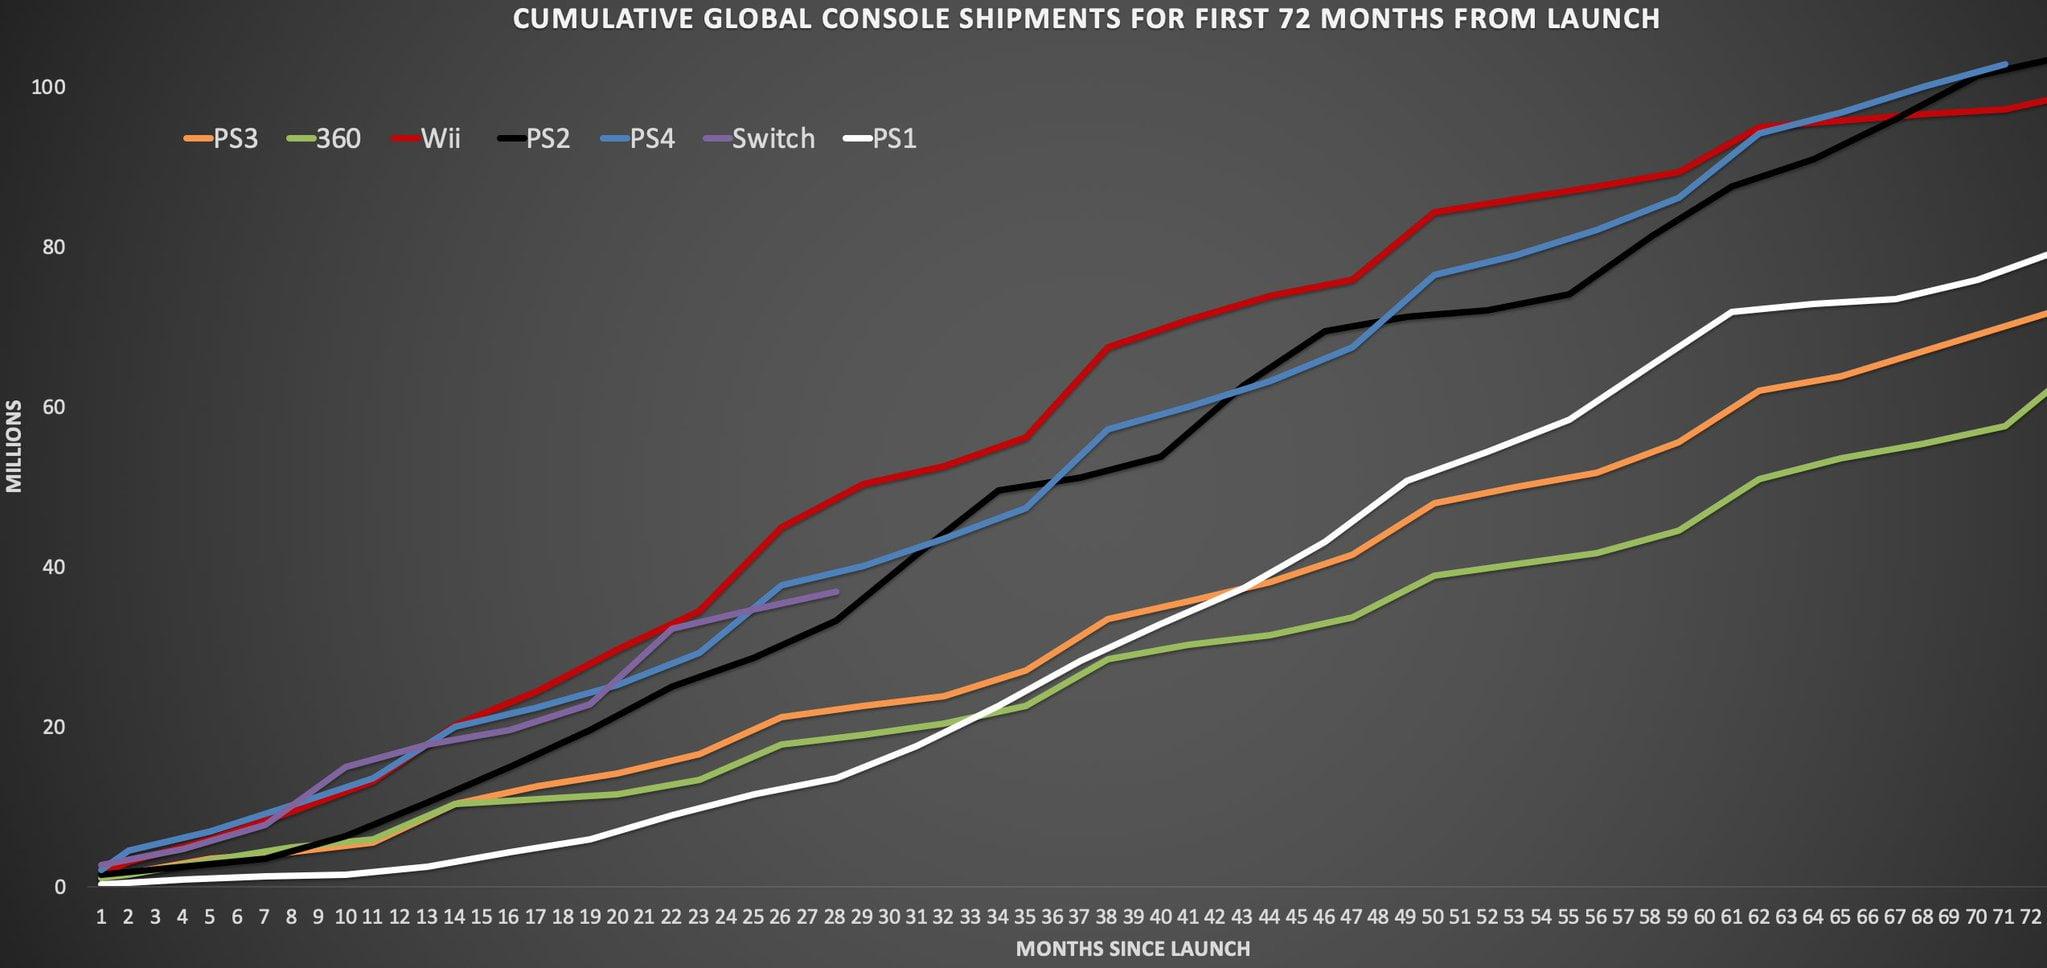 PS4 ultrapassa 102 milhões de unidades e supera o PS1 1